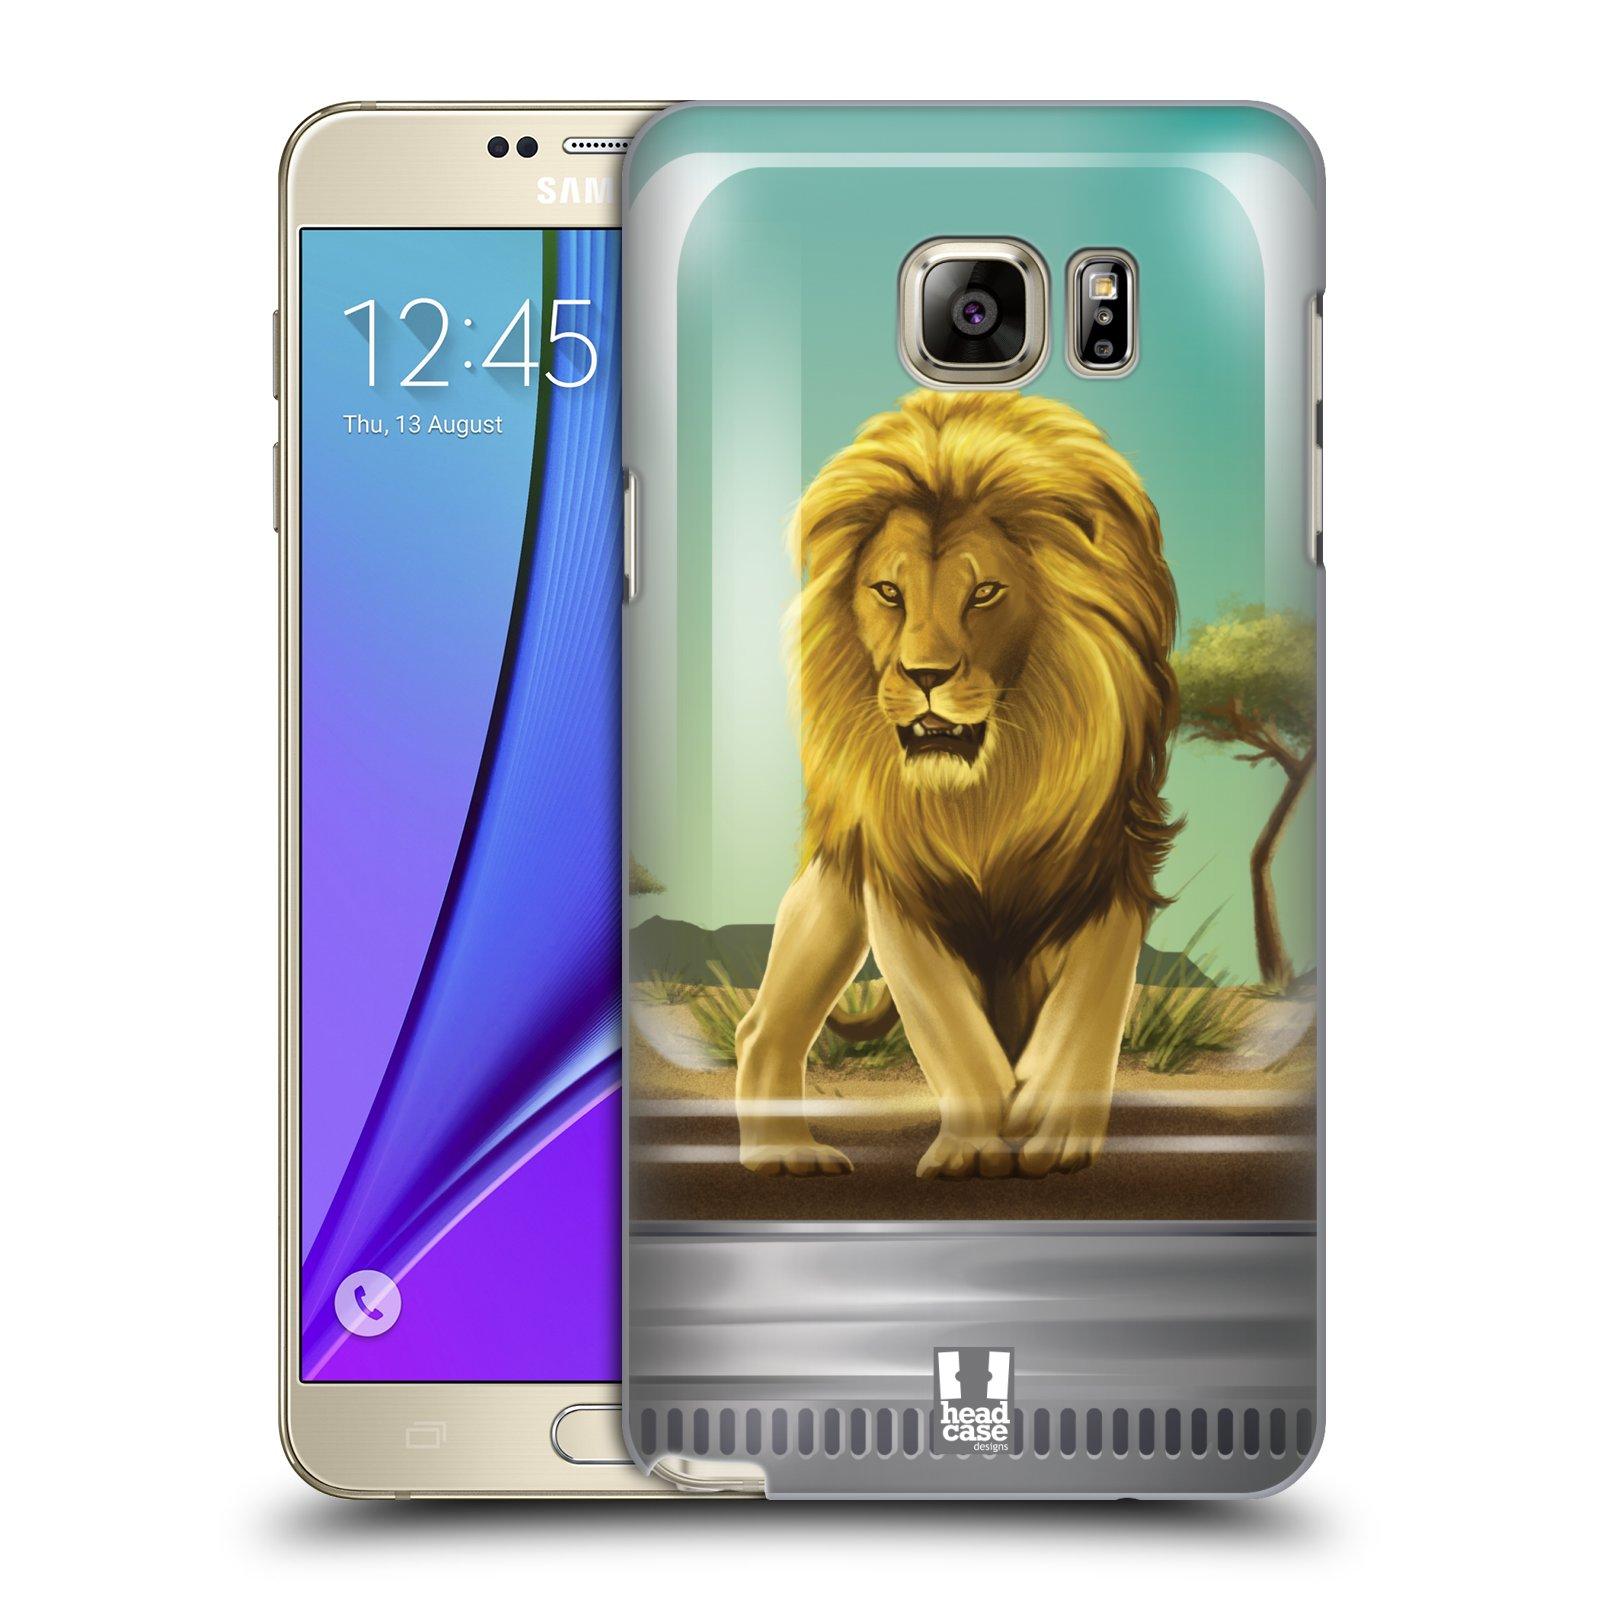 HEAD CASE plastový obal na mobil SAMSUNG Galaxy Note 5 (N920) vzor Zvířátka v těžítku lev